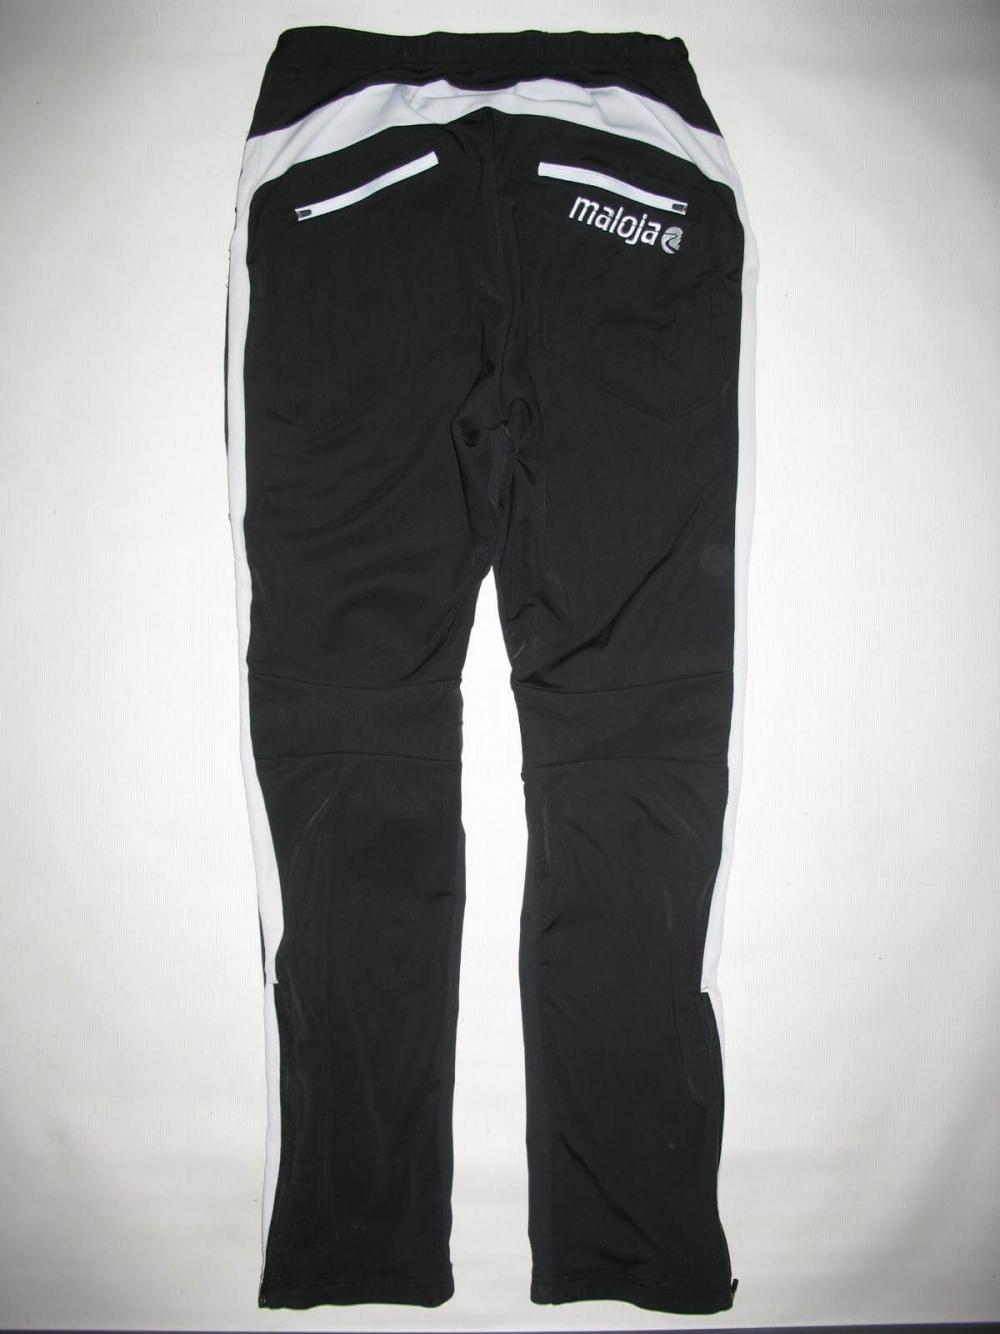 Велобрюки MALOJA sacha softshell pants (размер XL) - 2